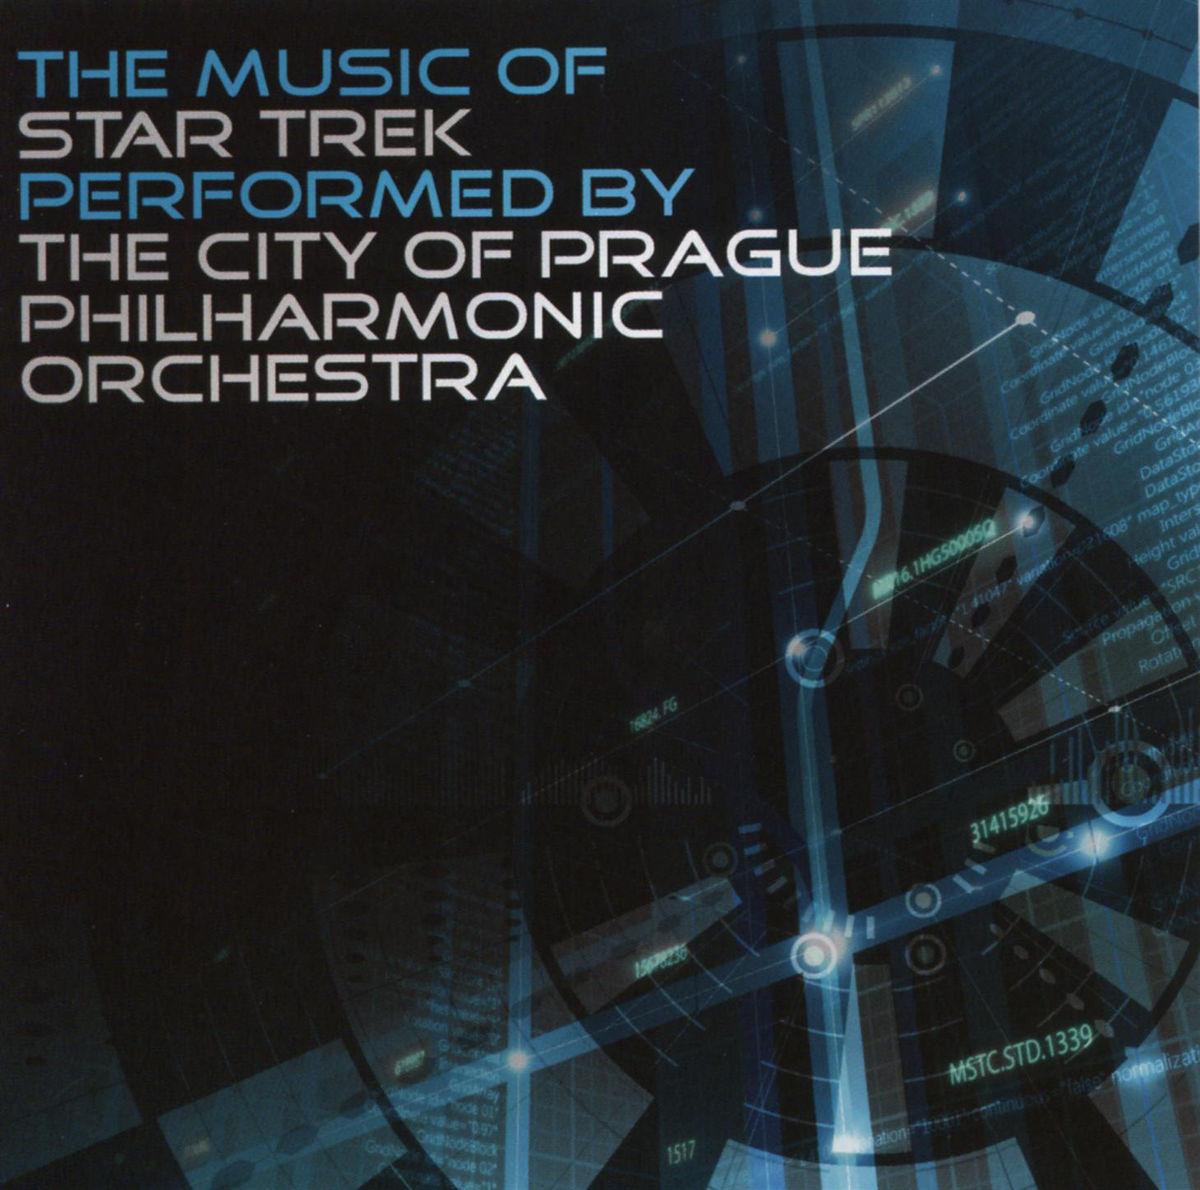 The Music of Star Trek (Album)